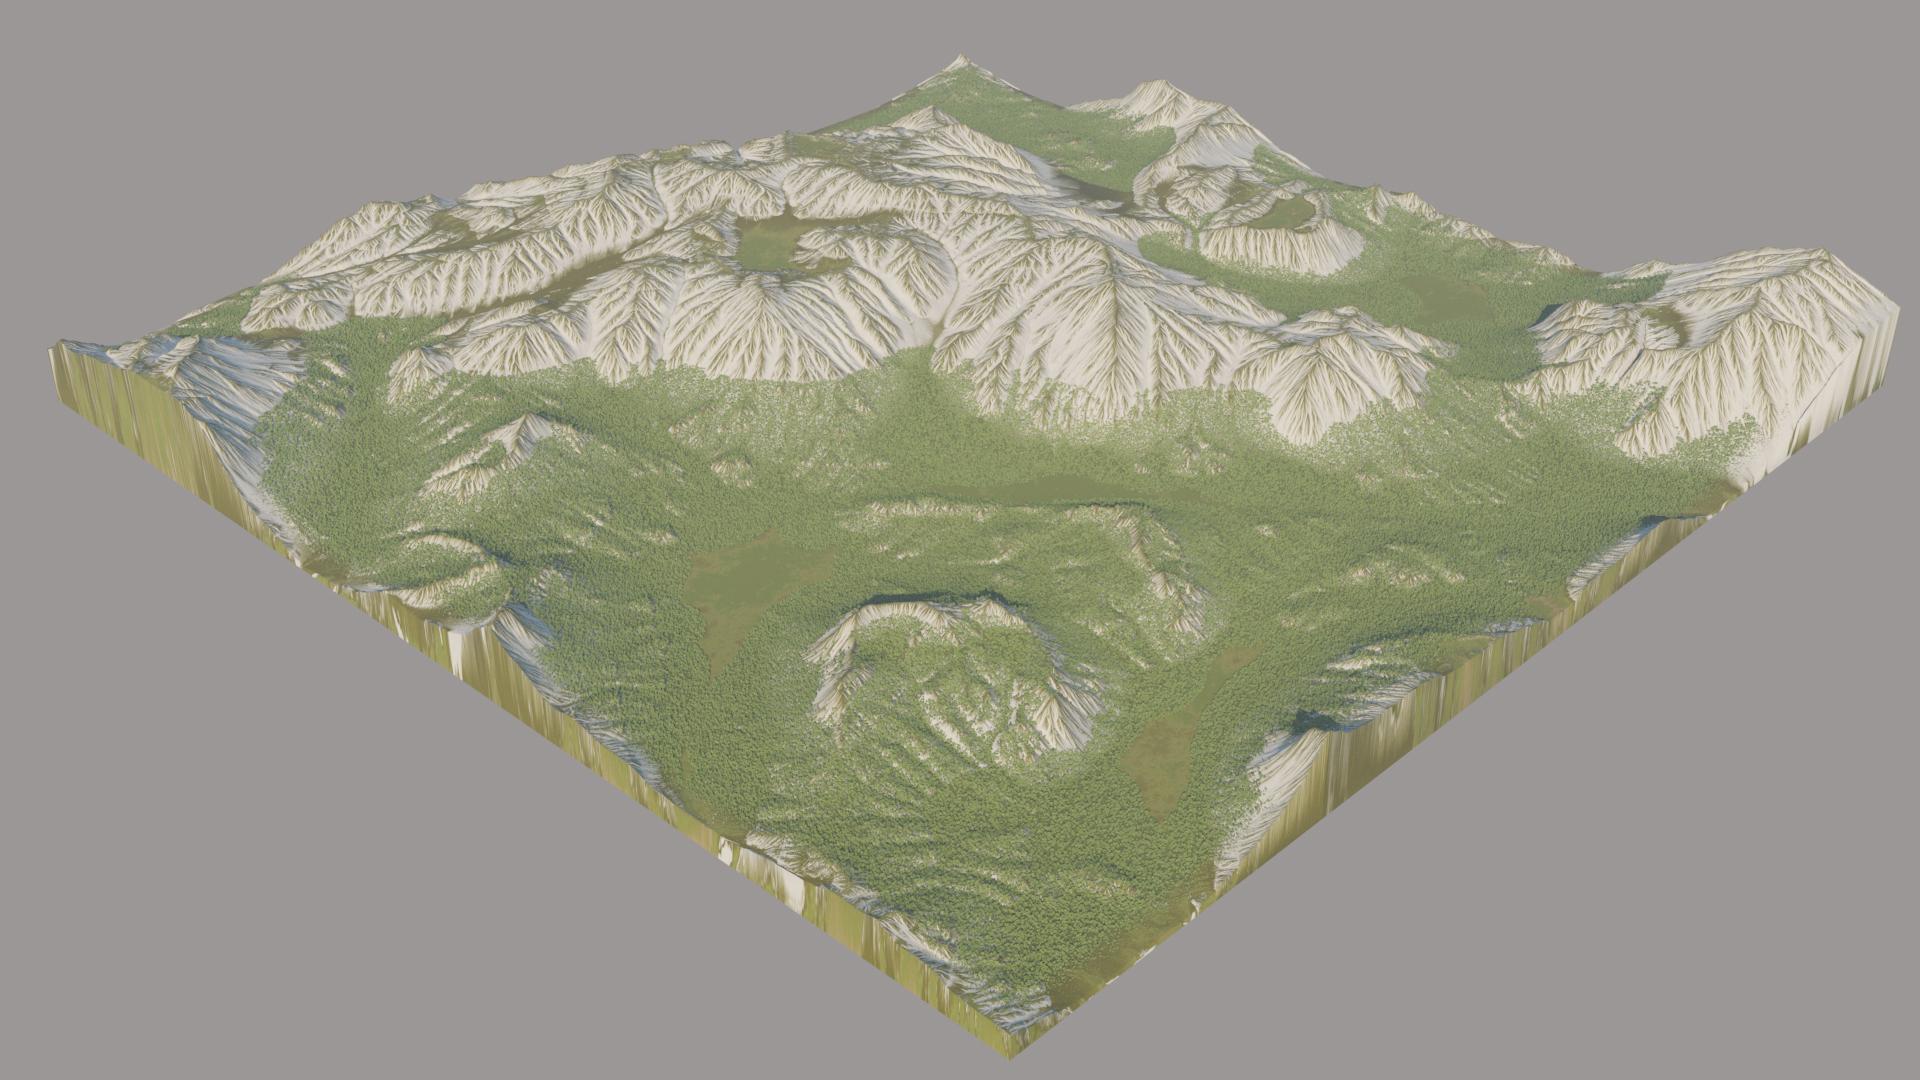 Jungle_MountainForest_04_